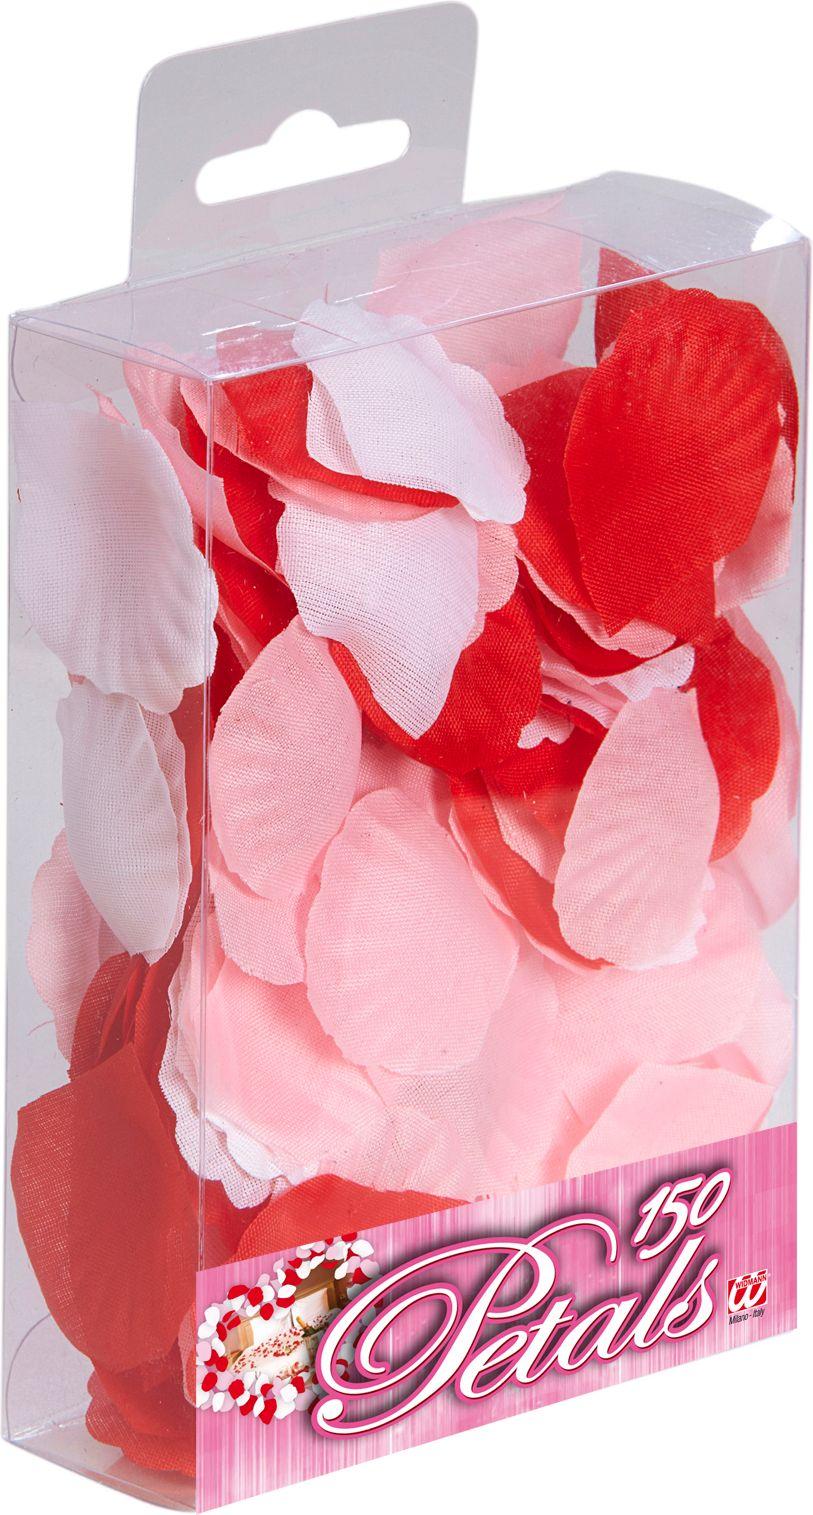 Rode, roze en witte rozen blaadjes 150 stuks